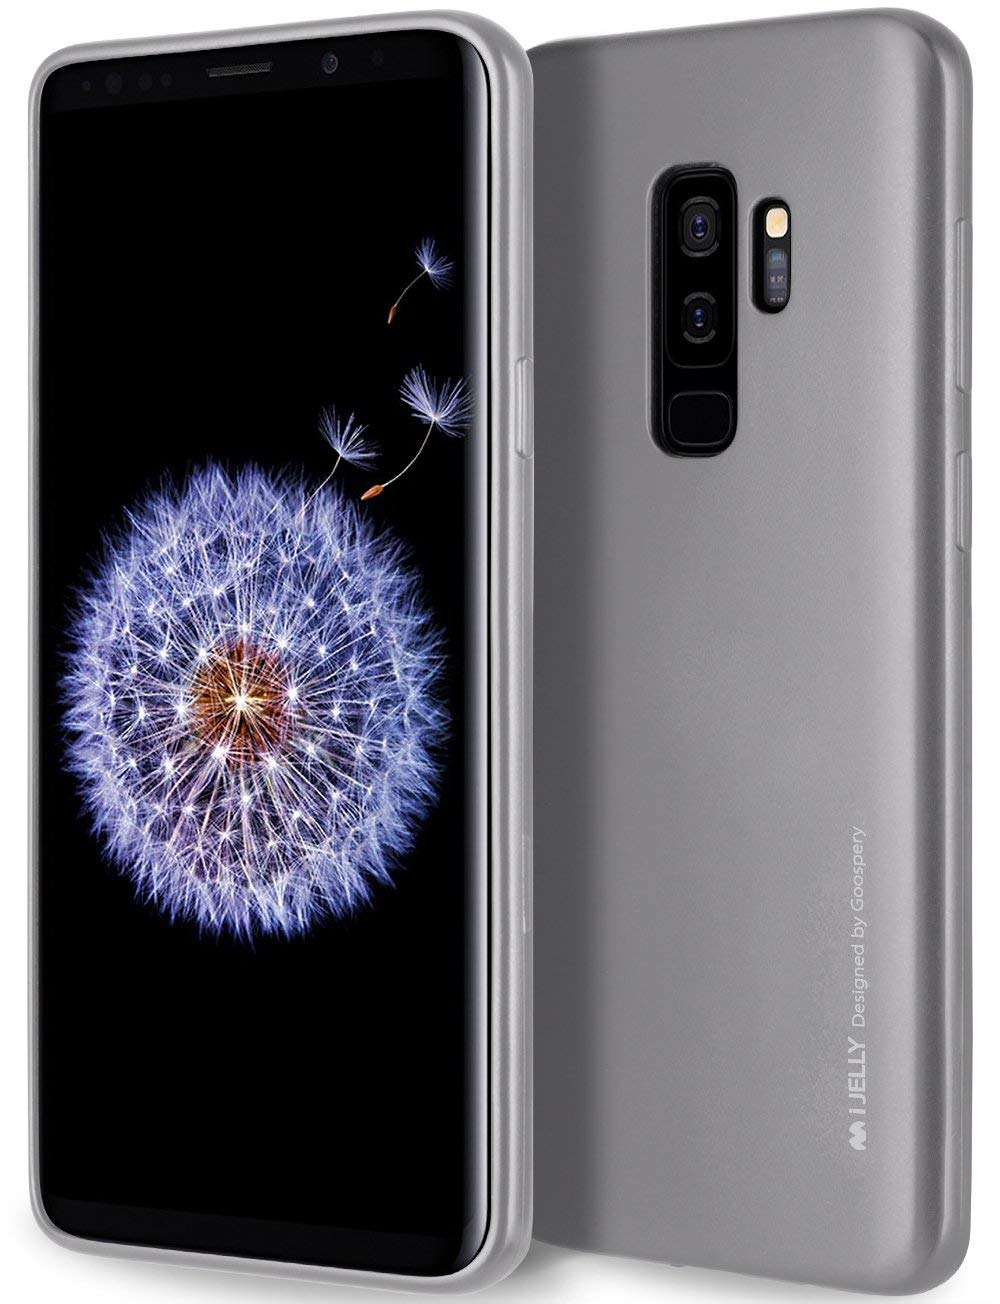 Silikonový kryt Goospery Mercury iJelly Metal na Galaxy S9 Plus - Šedý